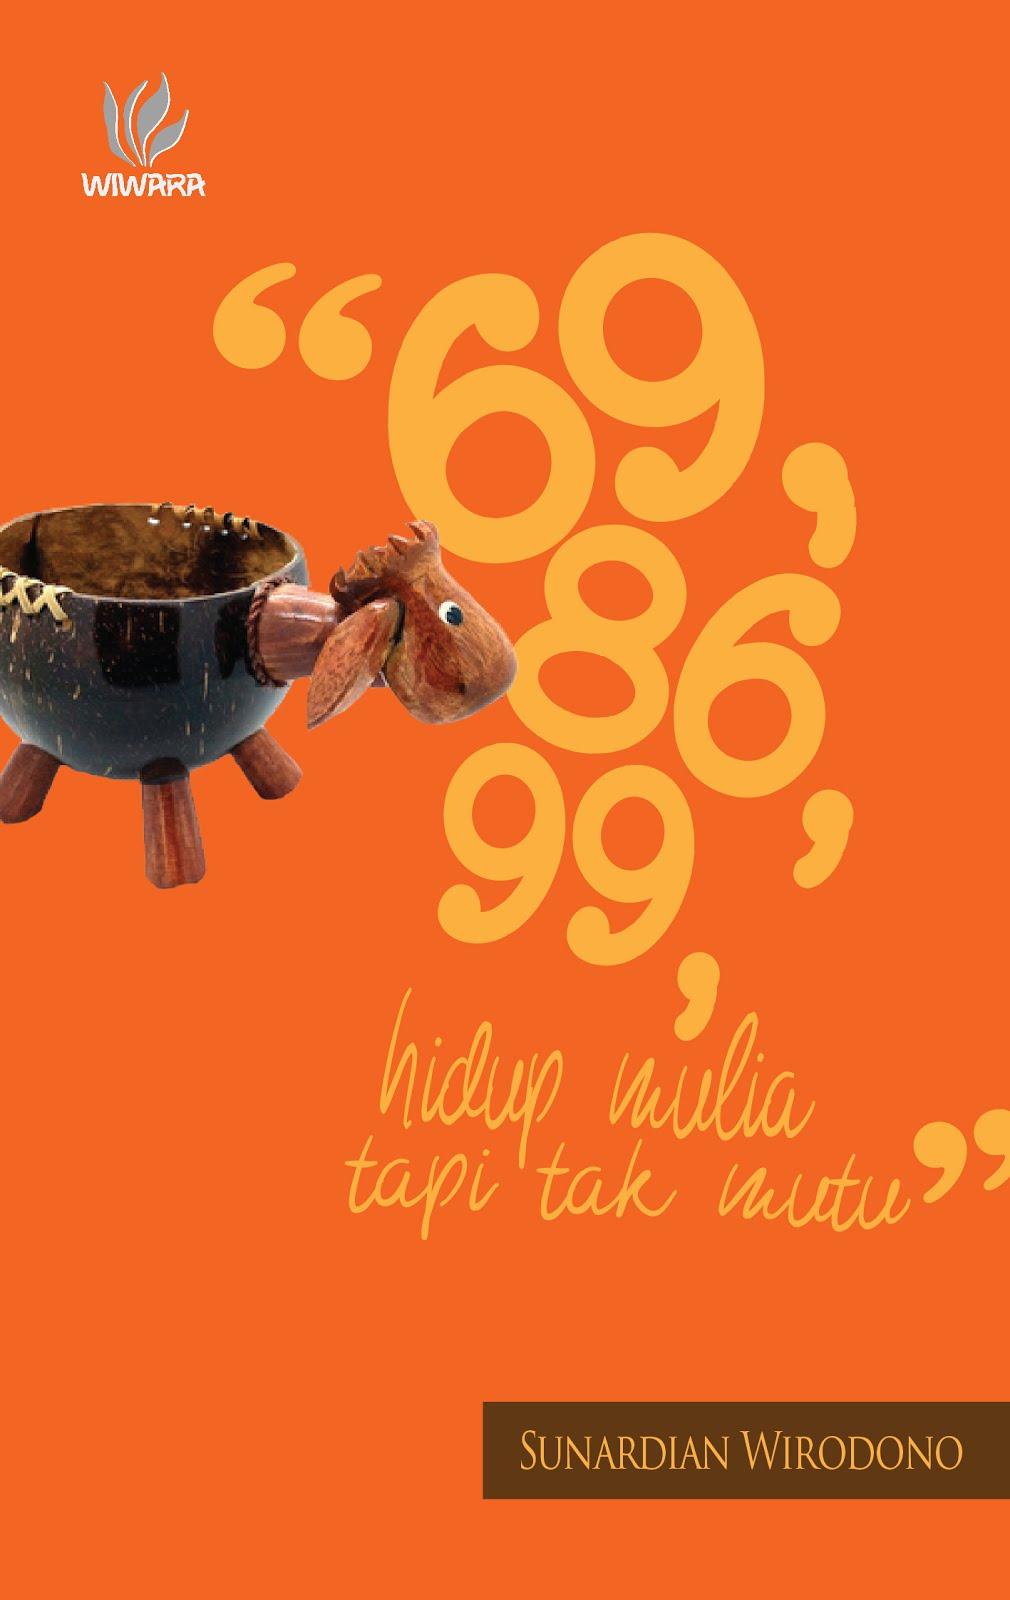 69, 86, 99, Hidup Mulia tapi Tak Mutu